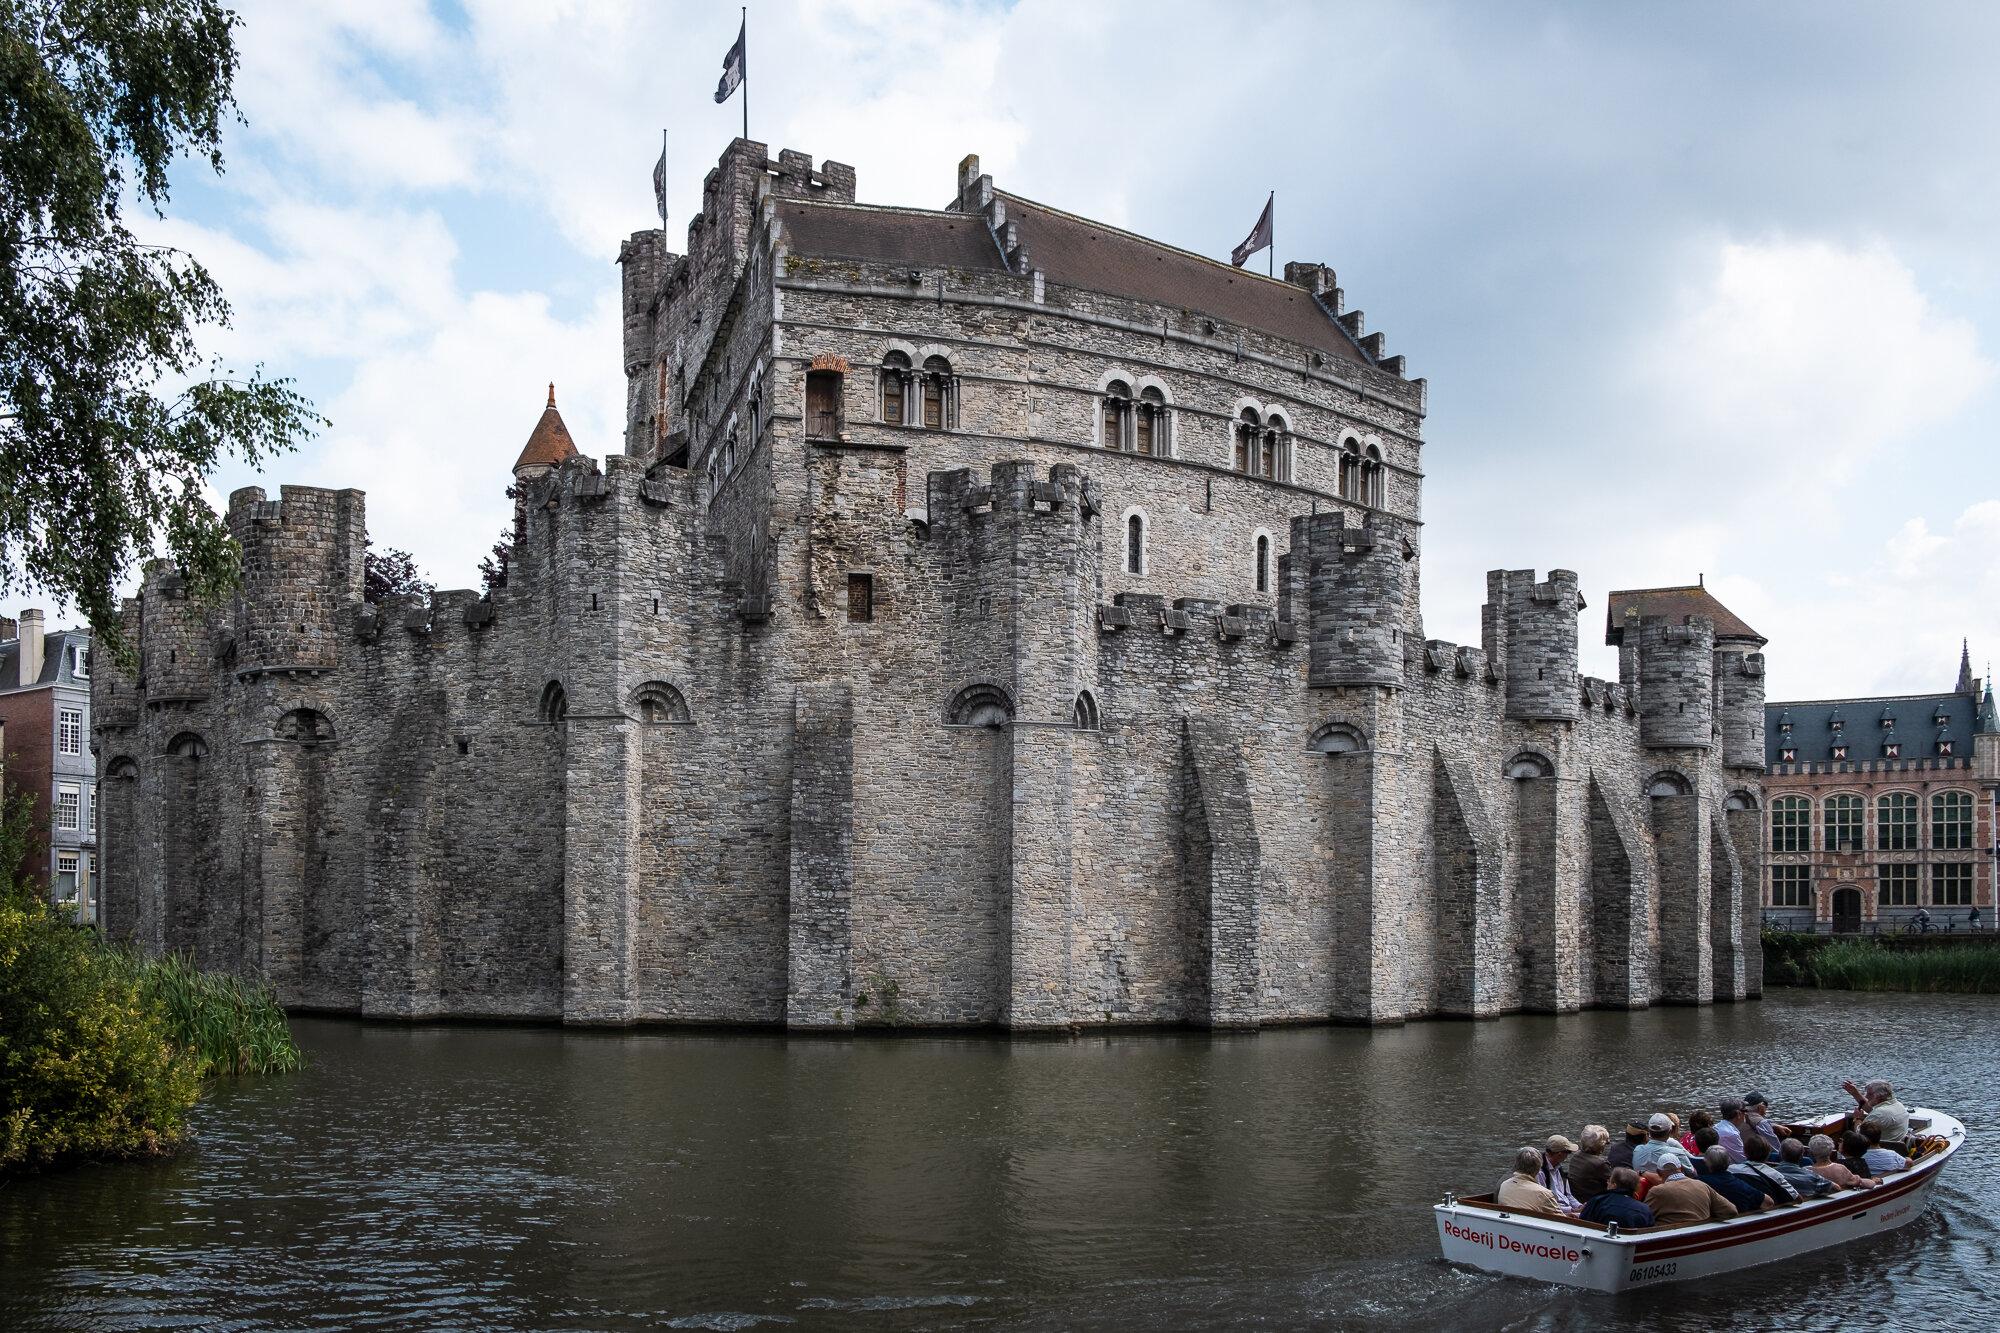 Gravensteen Medieval Castle | Fujifilm XT-30 | XF18-55mm | 18mm | 1/500 Second | f/6.4 | ISO160